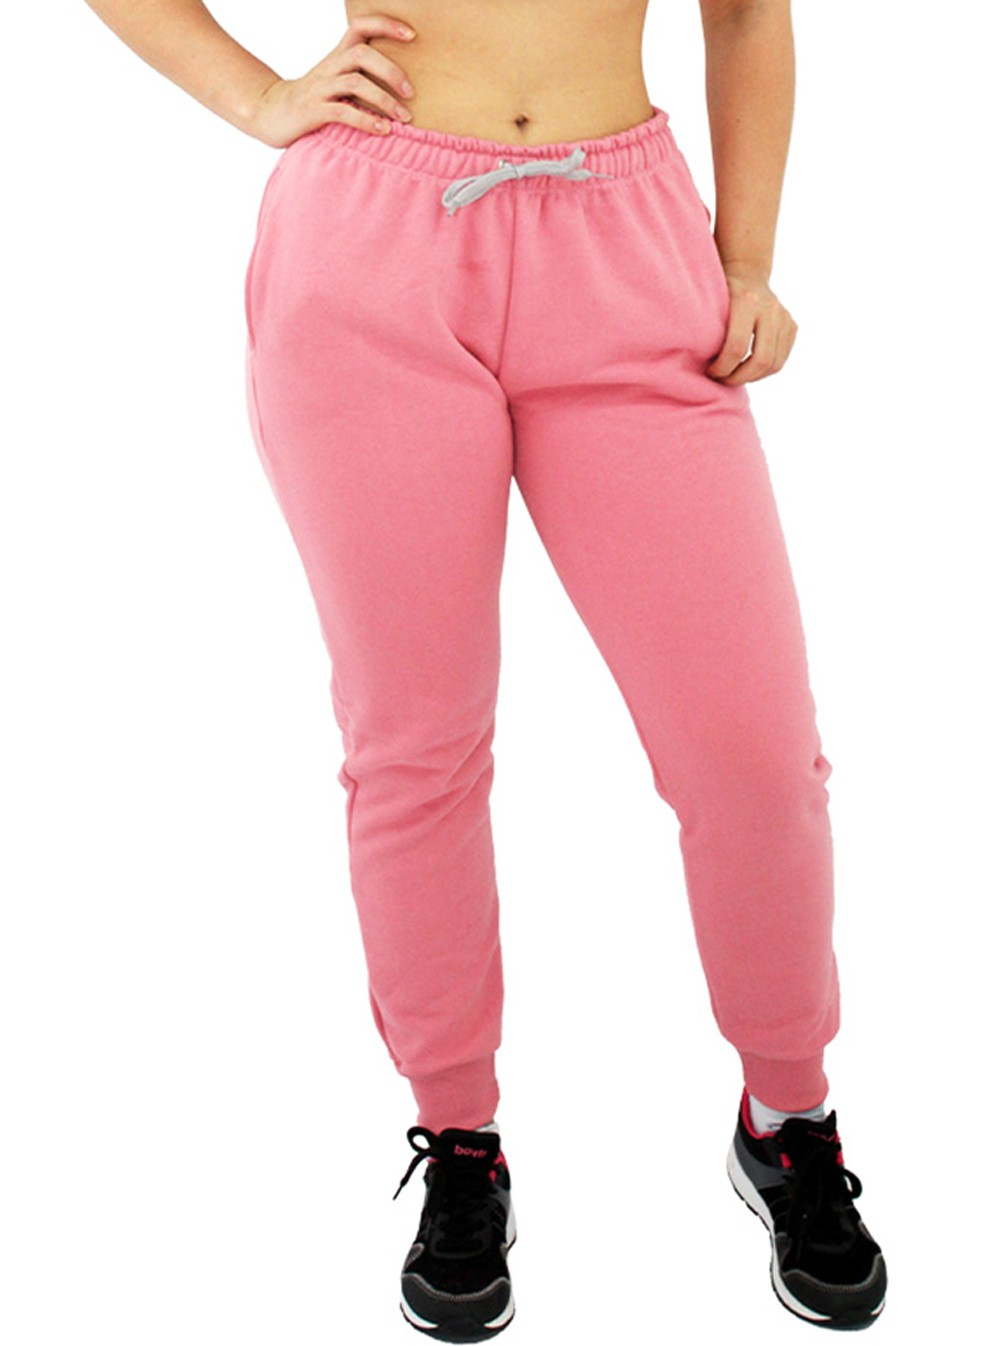 Calça Moletom Feminina Jogger Básica Rosa